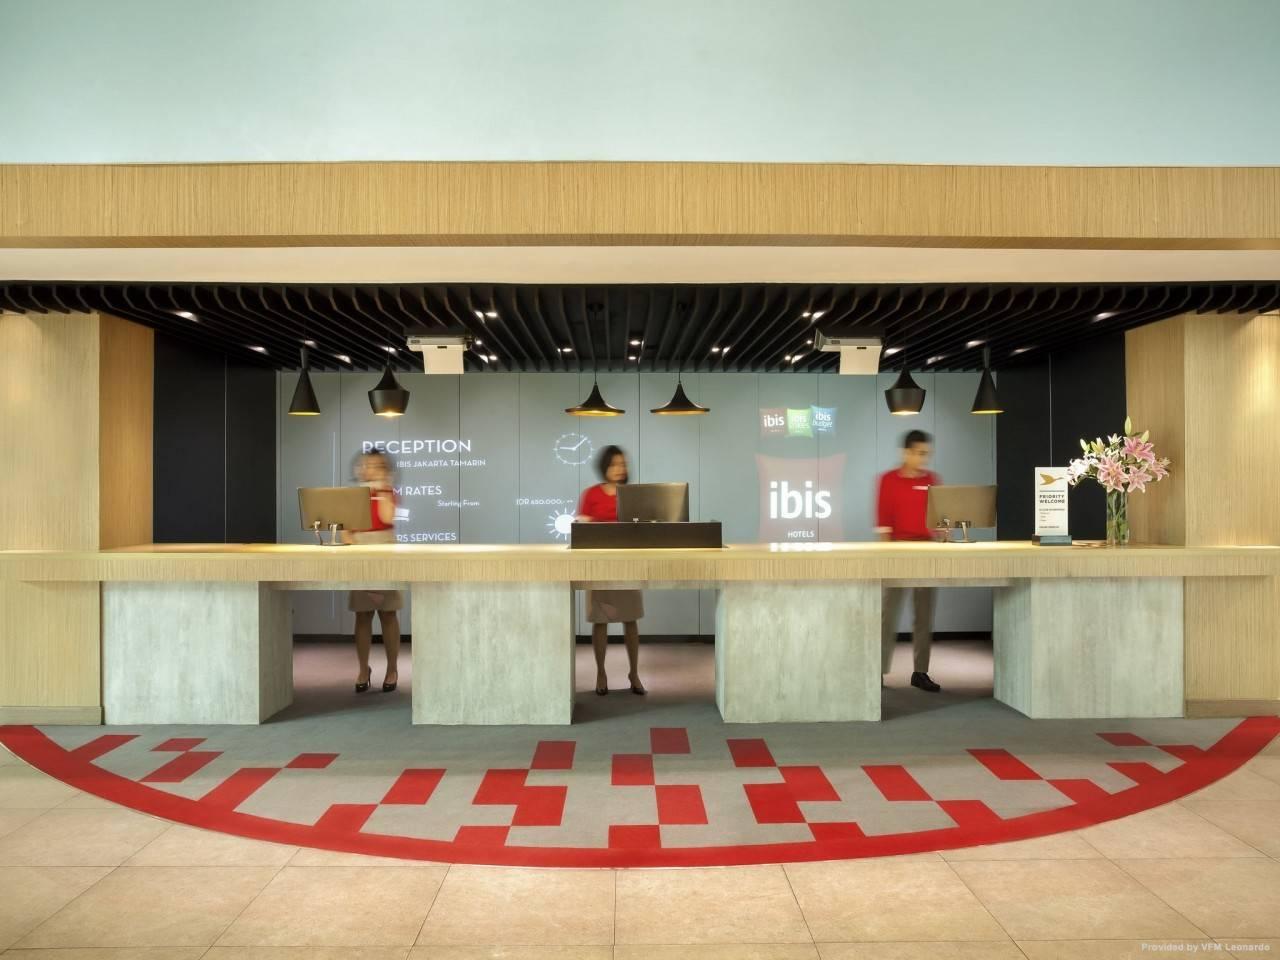 Hotel Ibis Jakarta Tamarin 3 Hrs Star Hotel In Jakarta